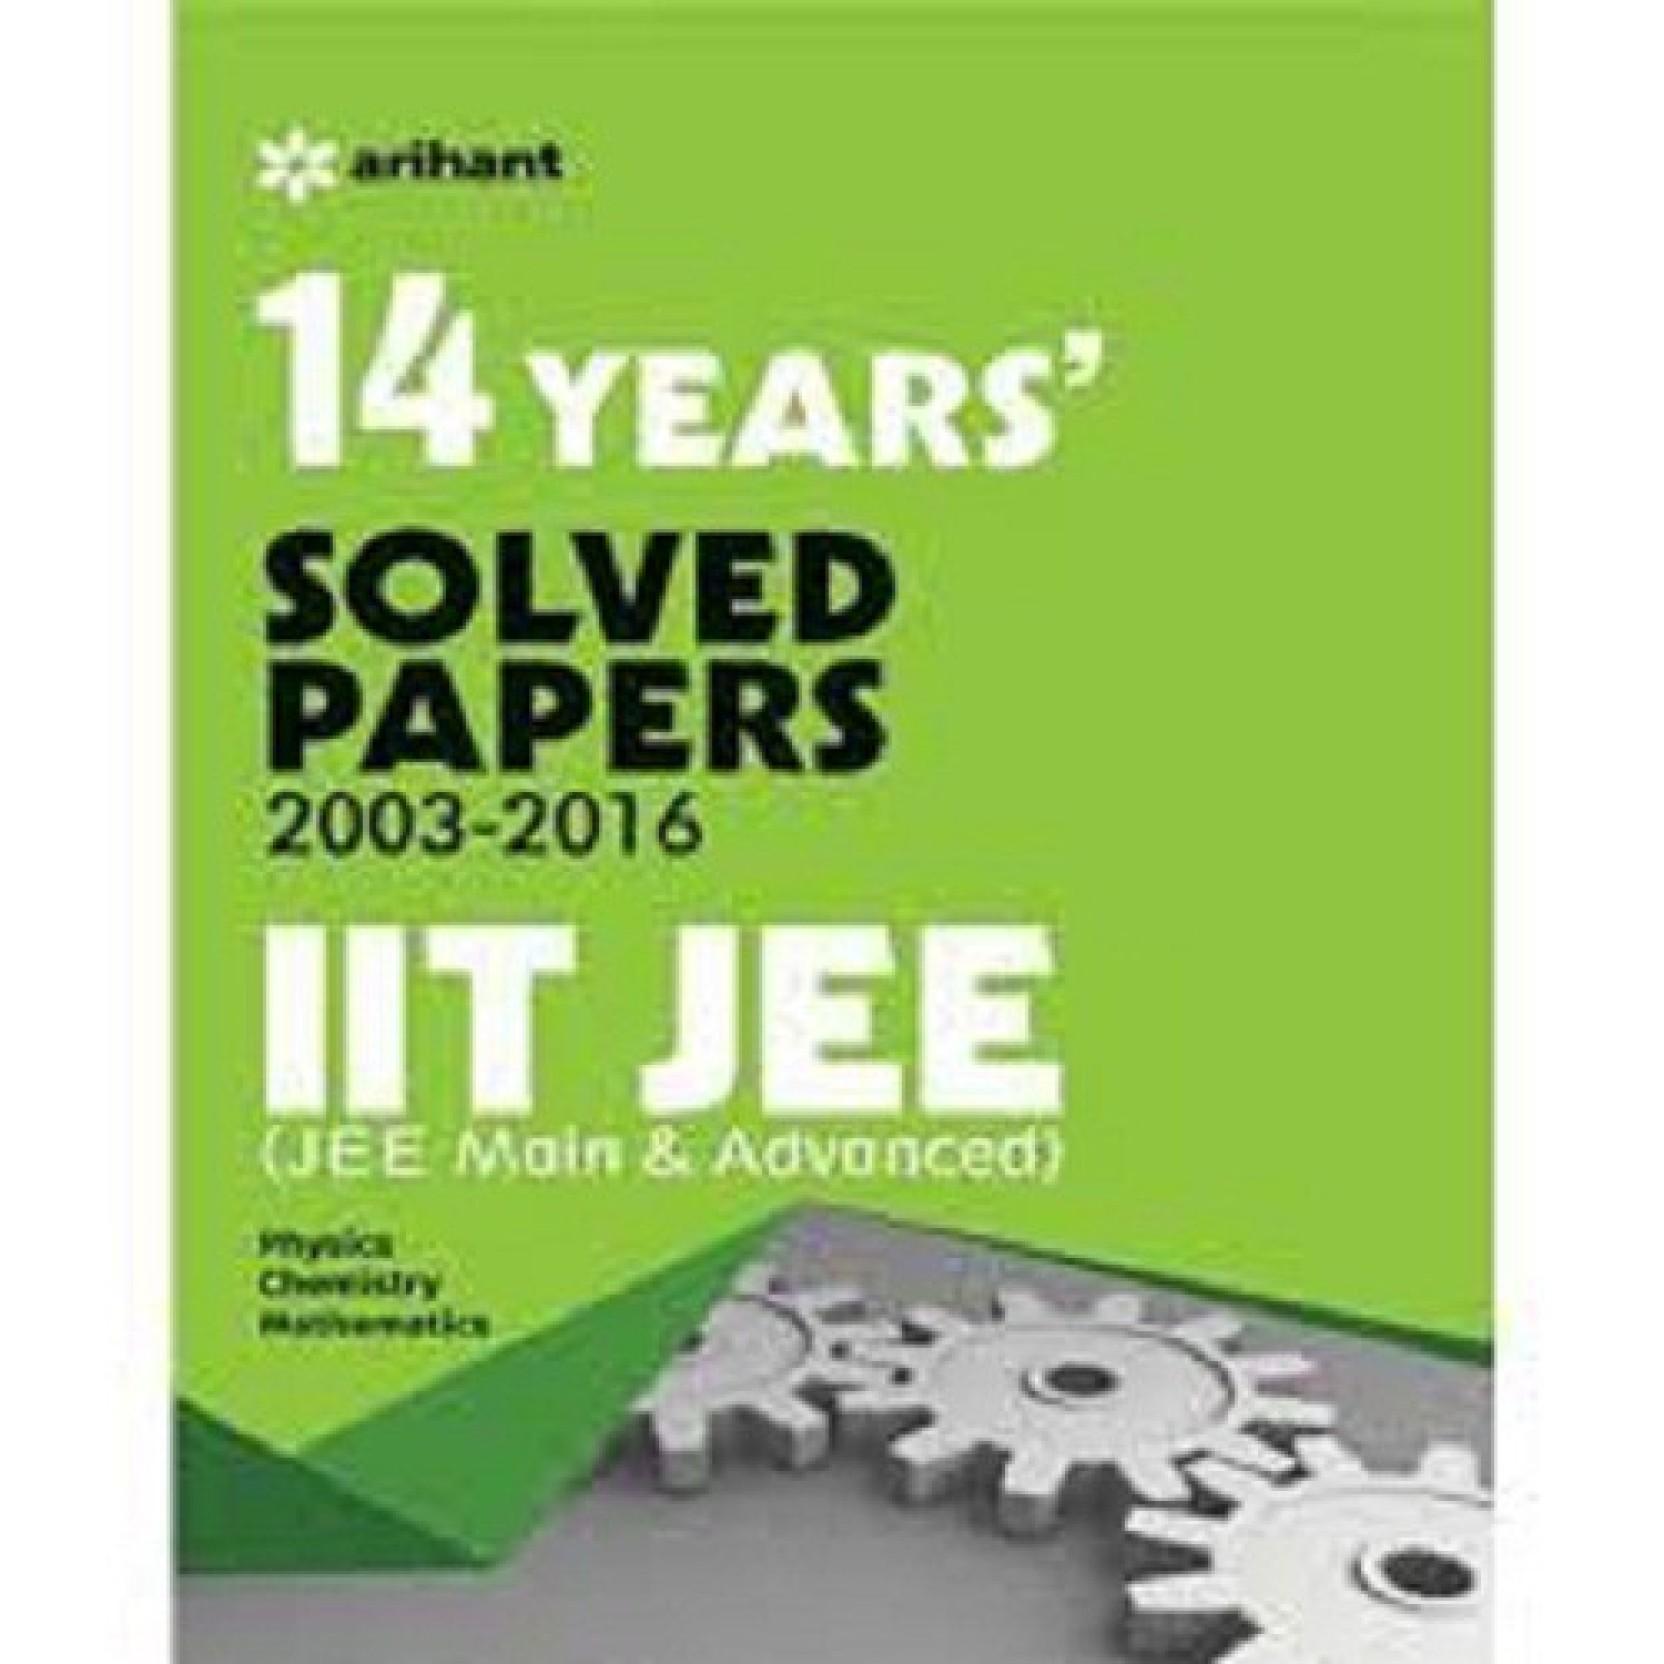 14 Years' (2002-2015) IIT JEE (JEE MAIN & ADVANCED). ADD TO CART